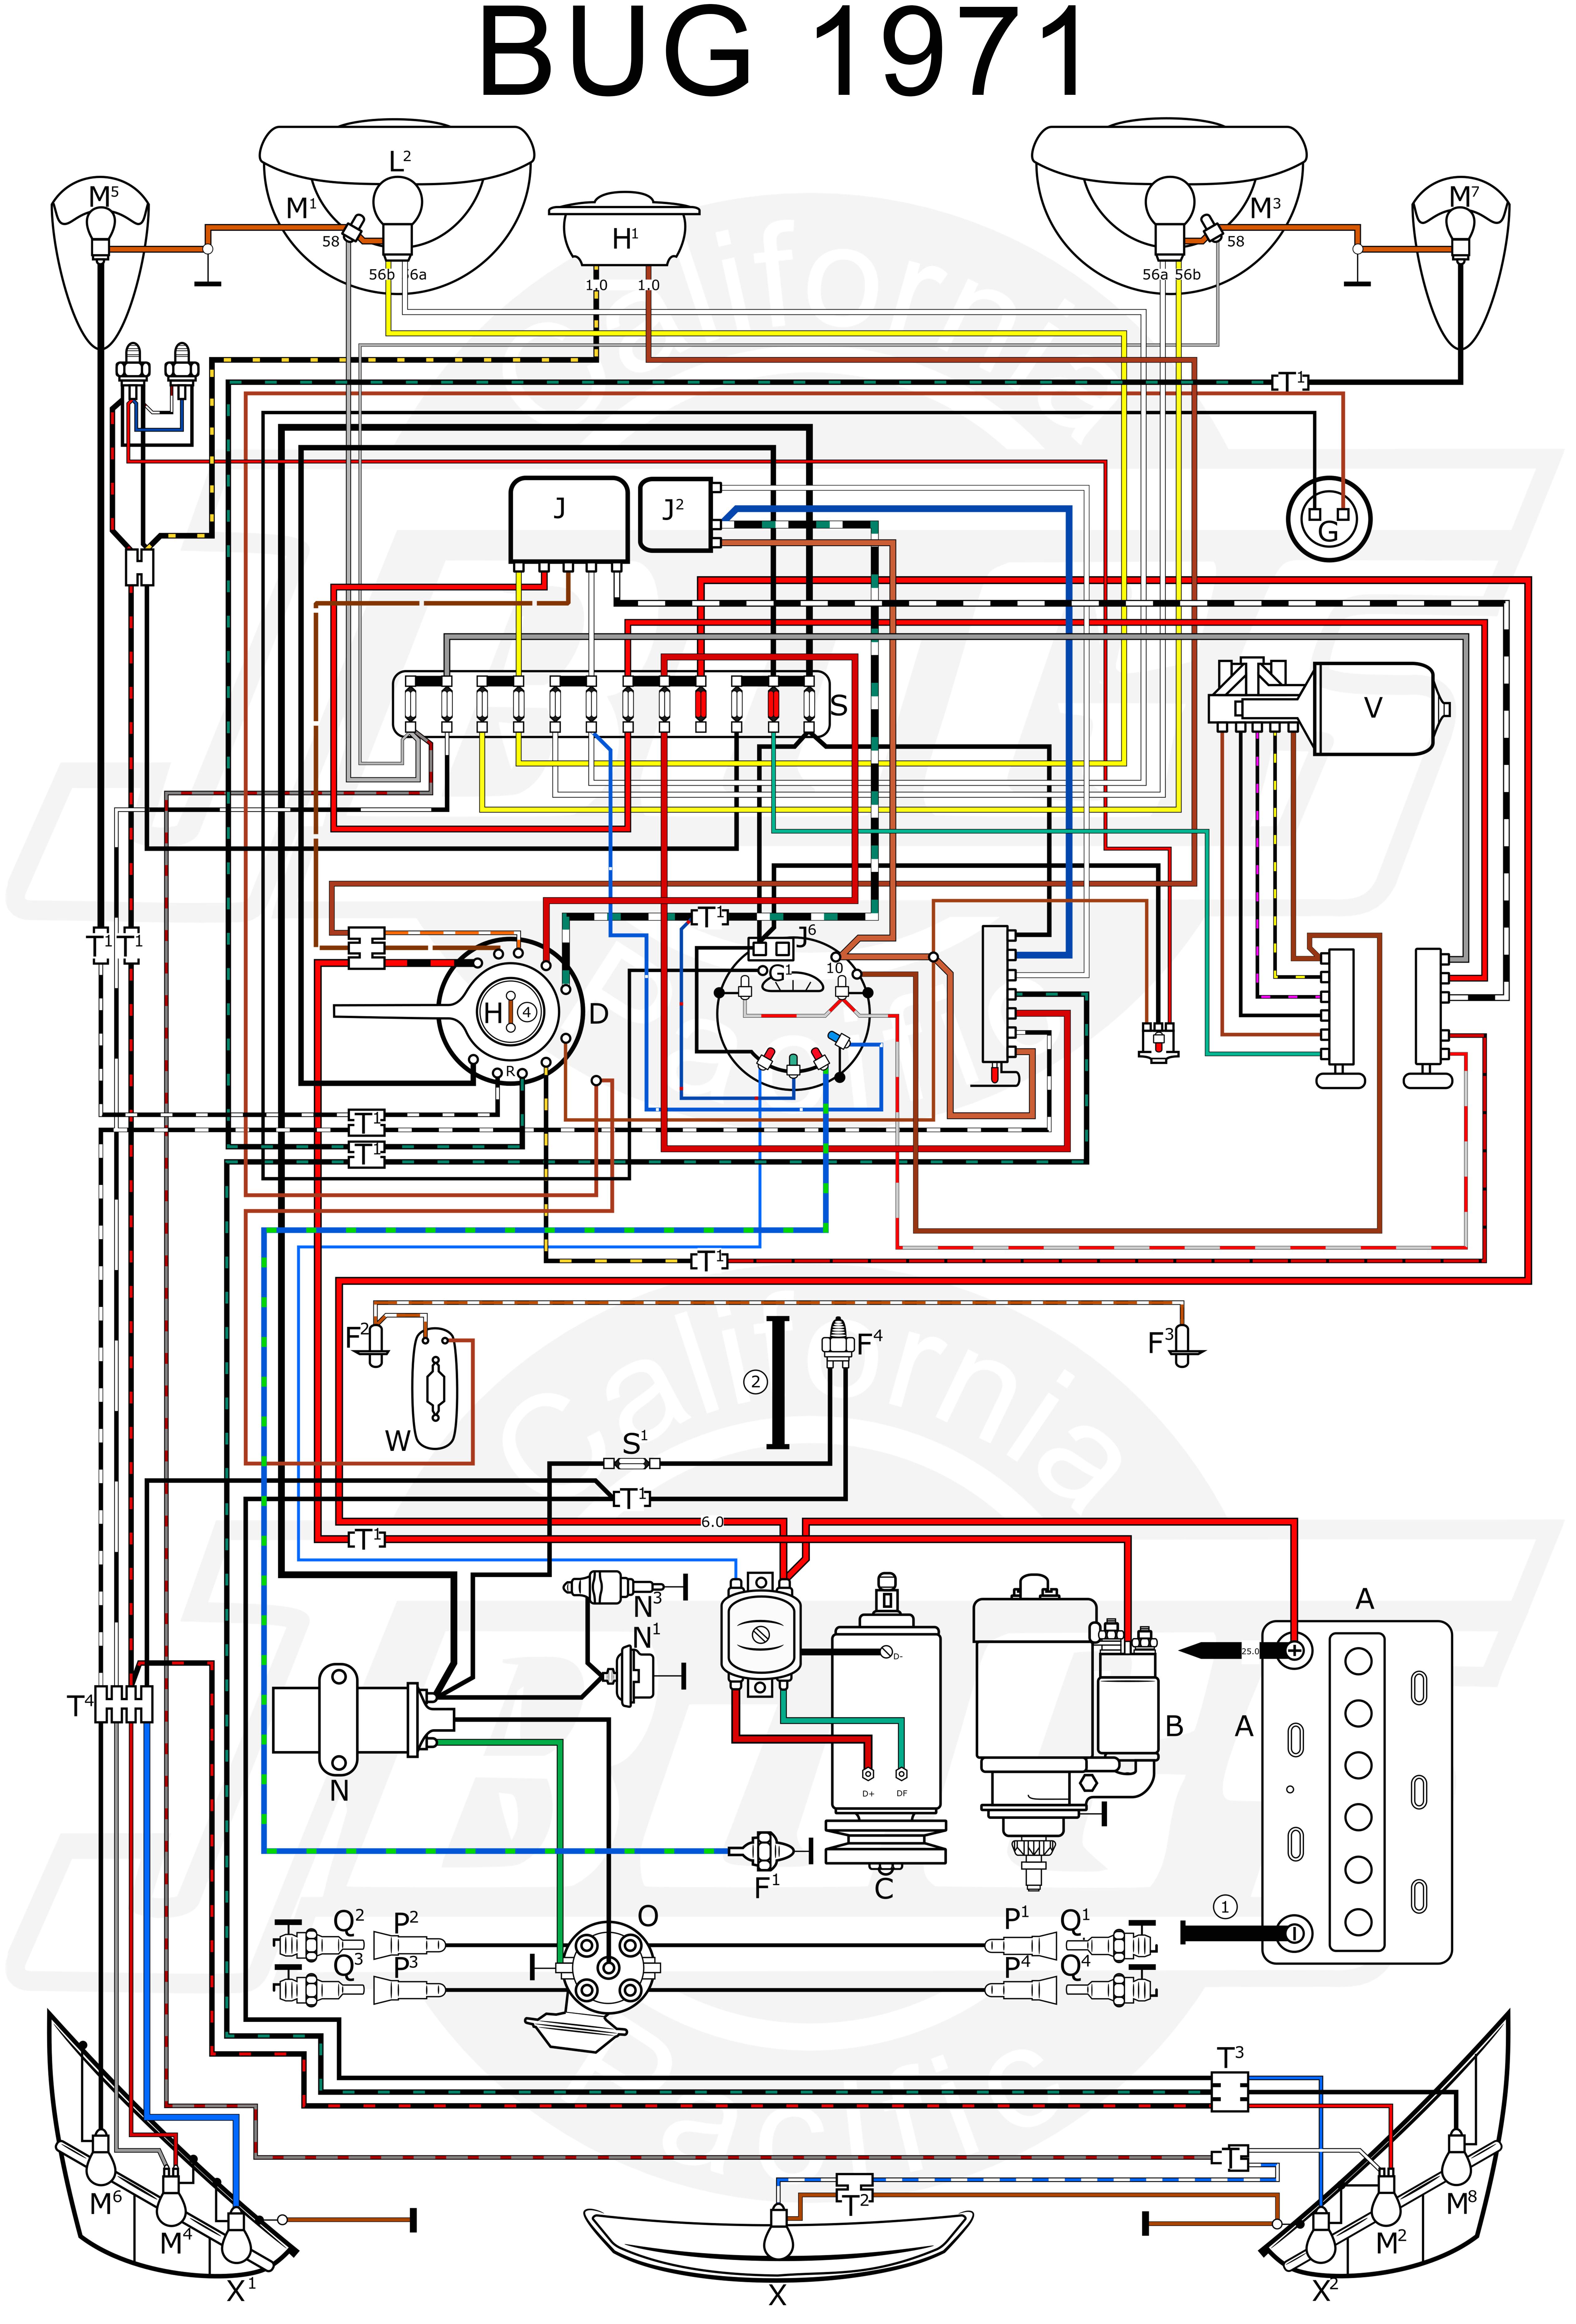 71 volkswagen wiring diagram wiring diagram rows 1971 super beetle wiring diagram 1971 vw wiring diagram